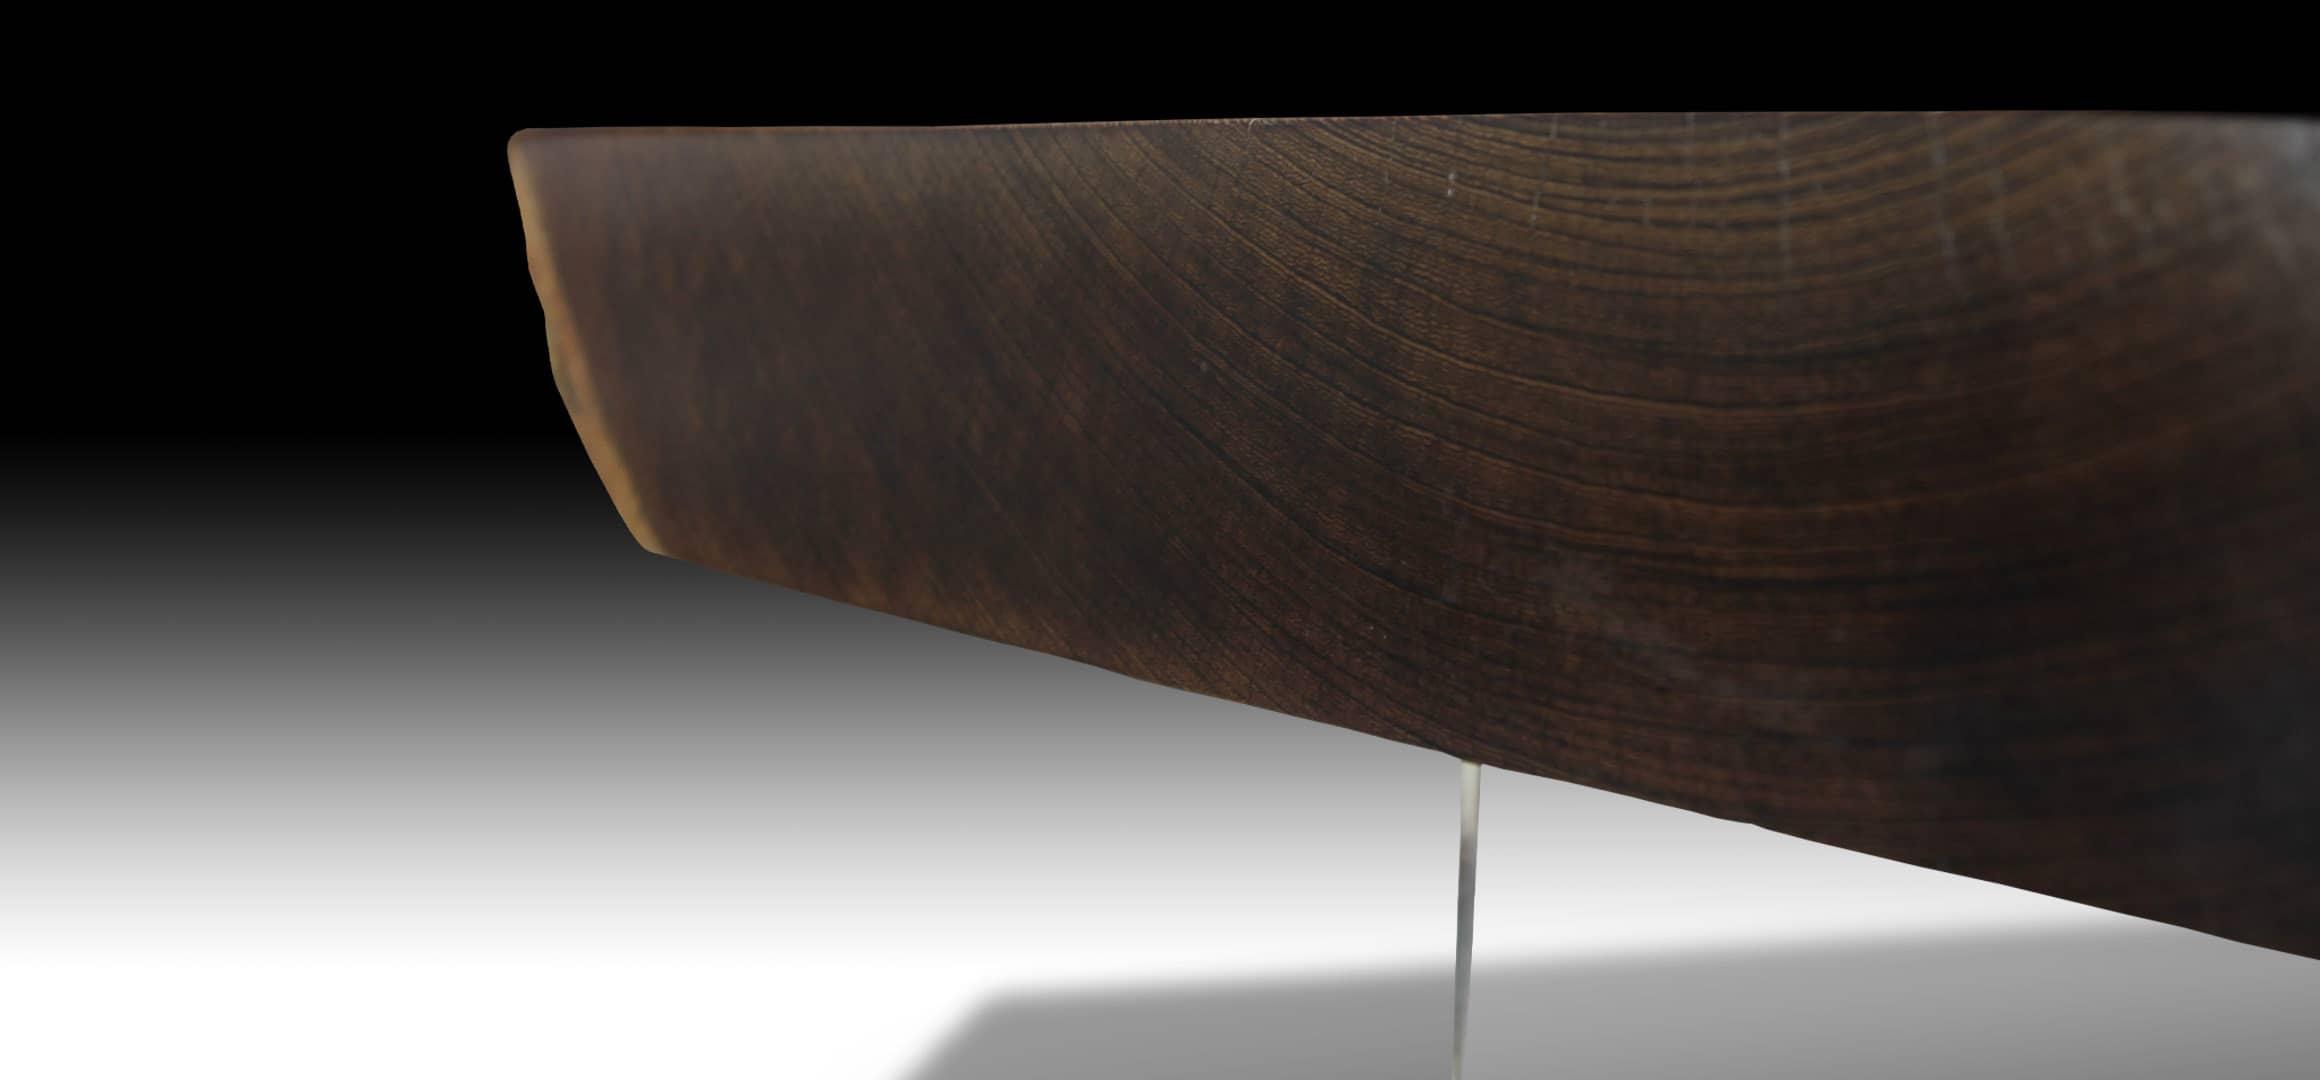 Mandarin live edge Walnut wood dining table side view